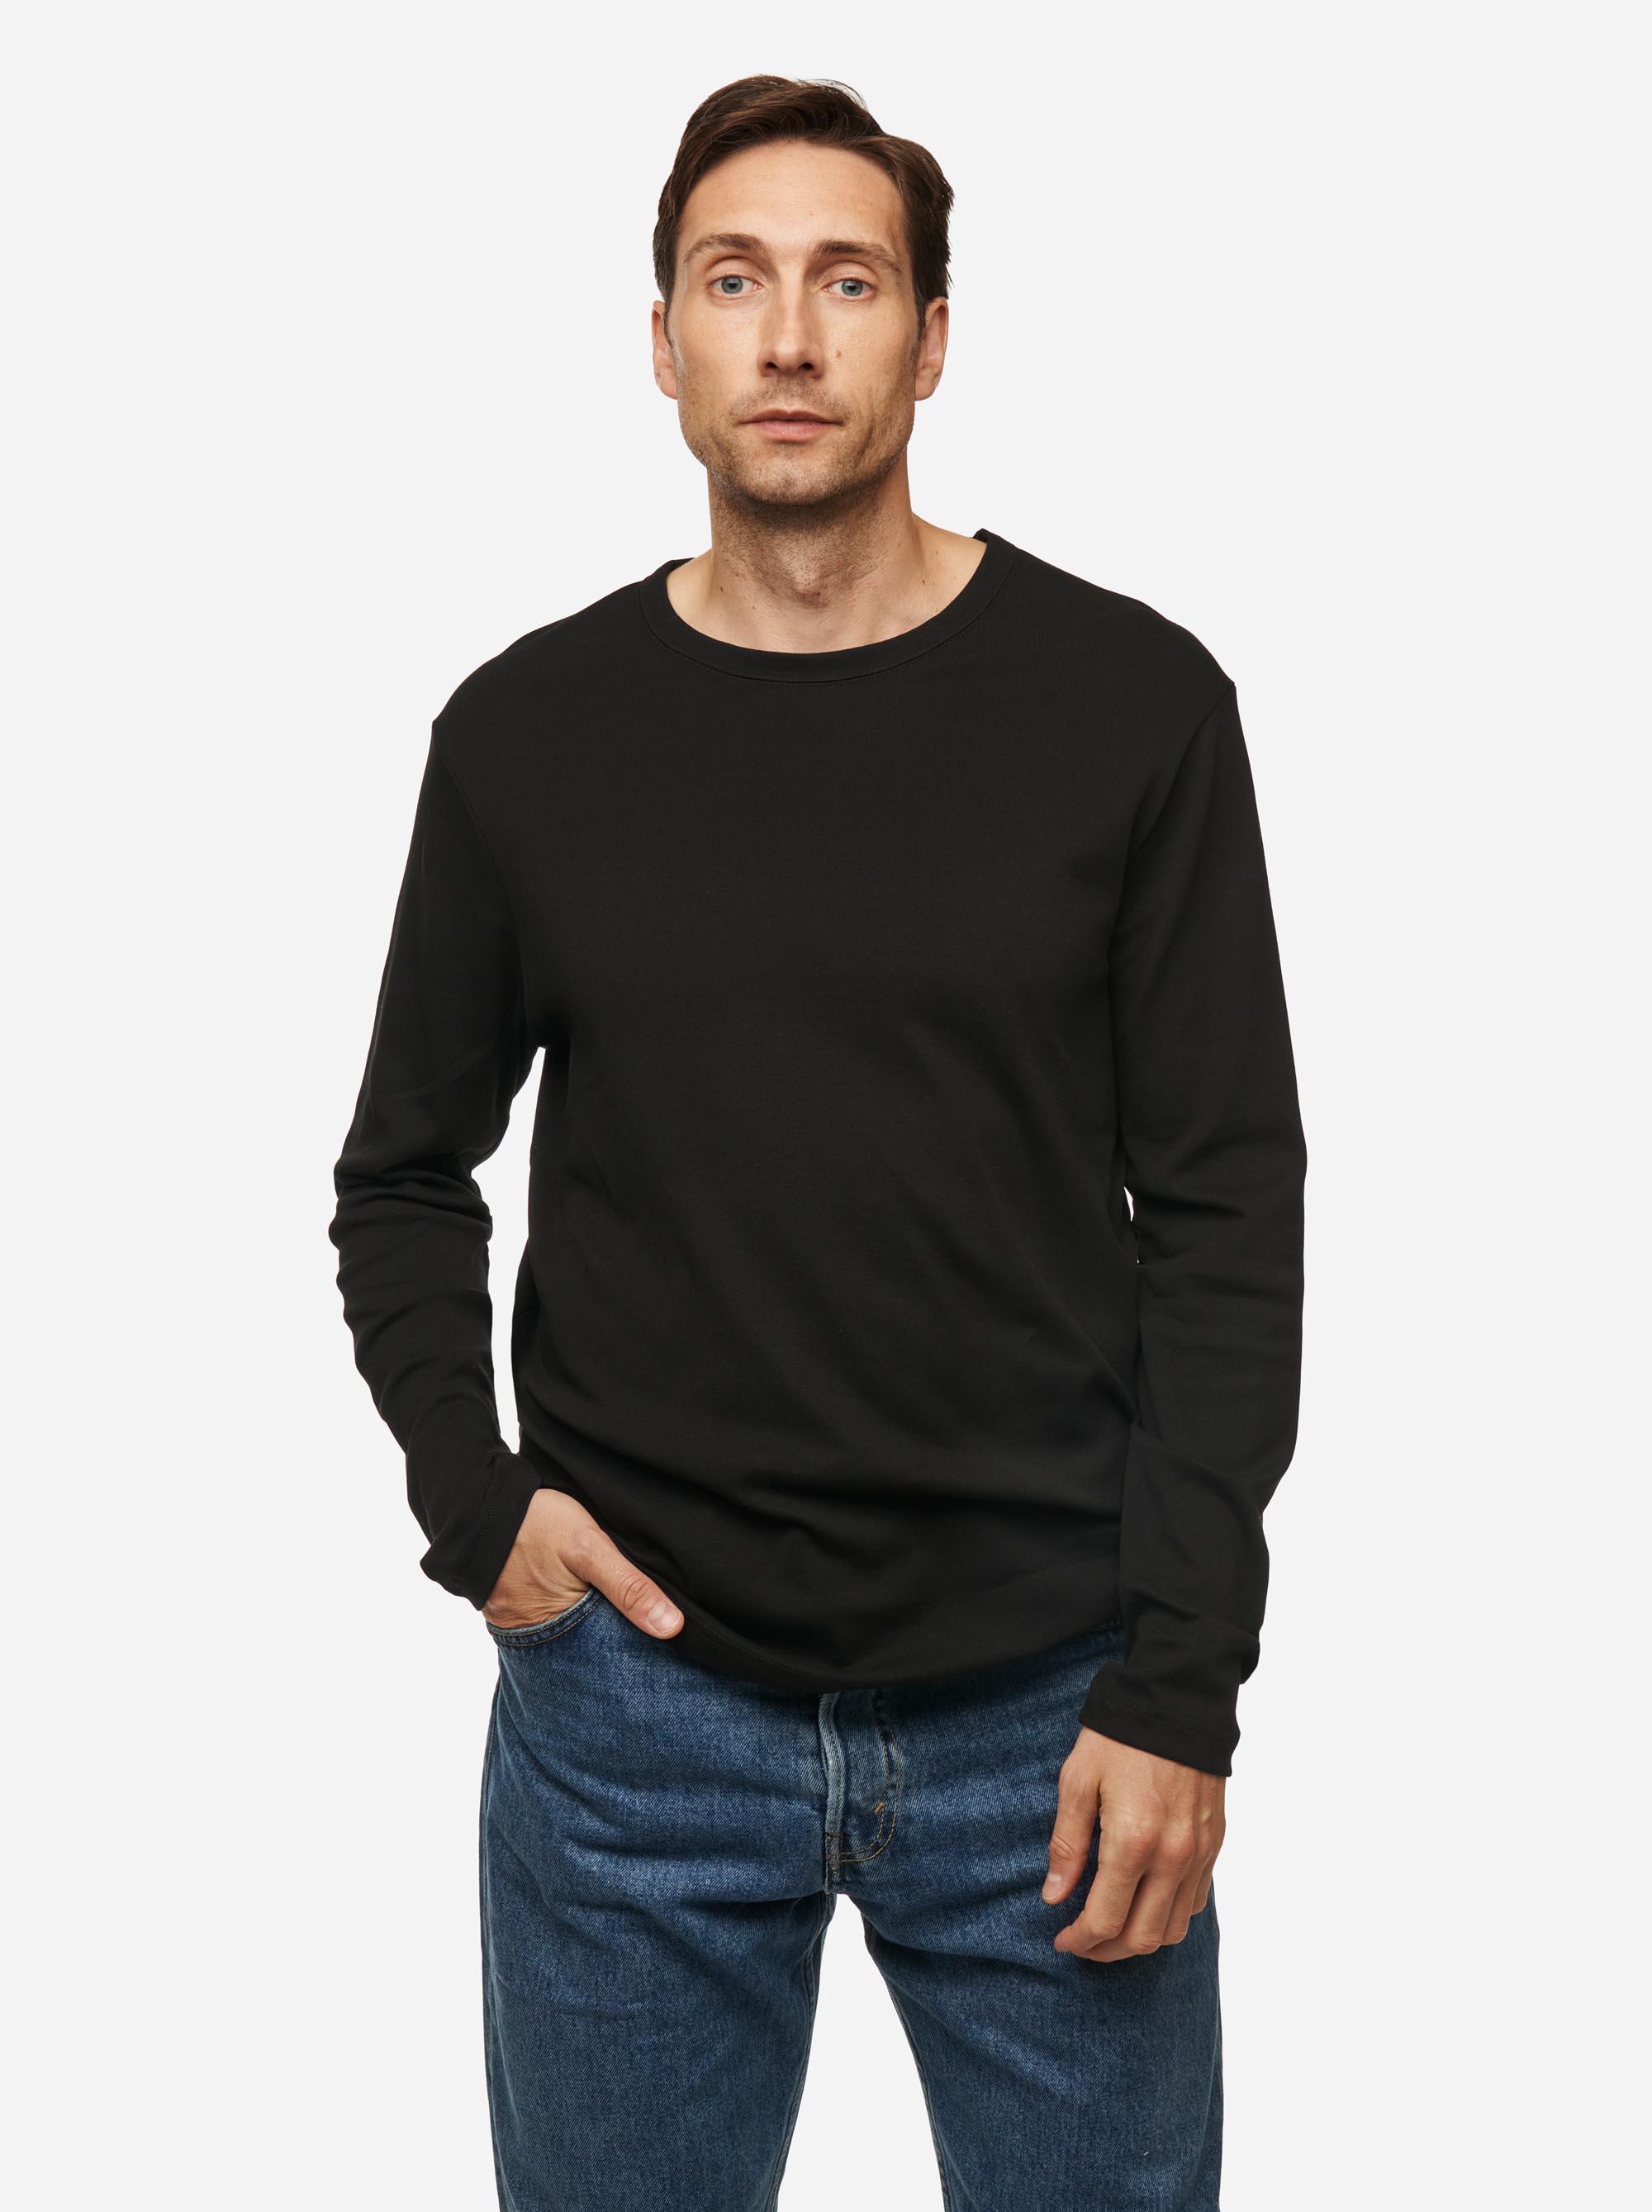 Teym - The-T-Shirt - Longsleeve - Men - Black - 1